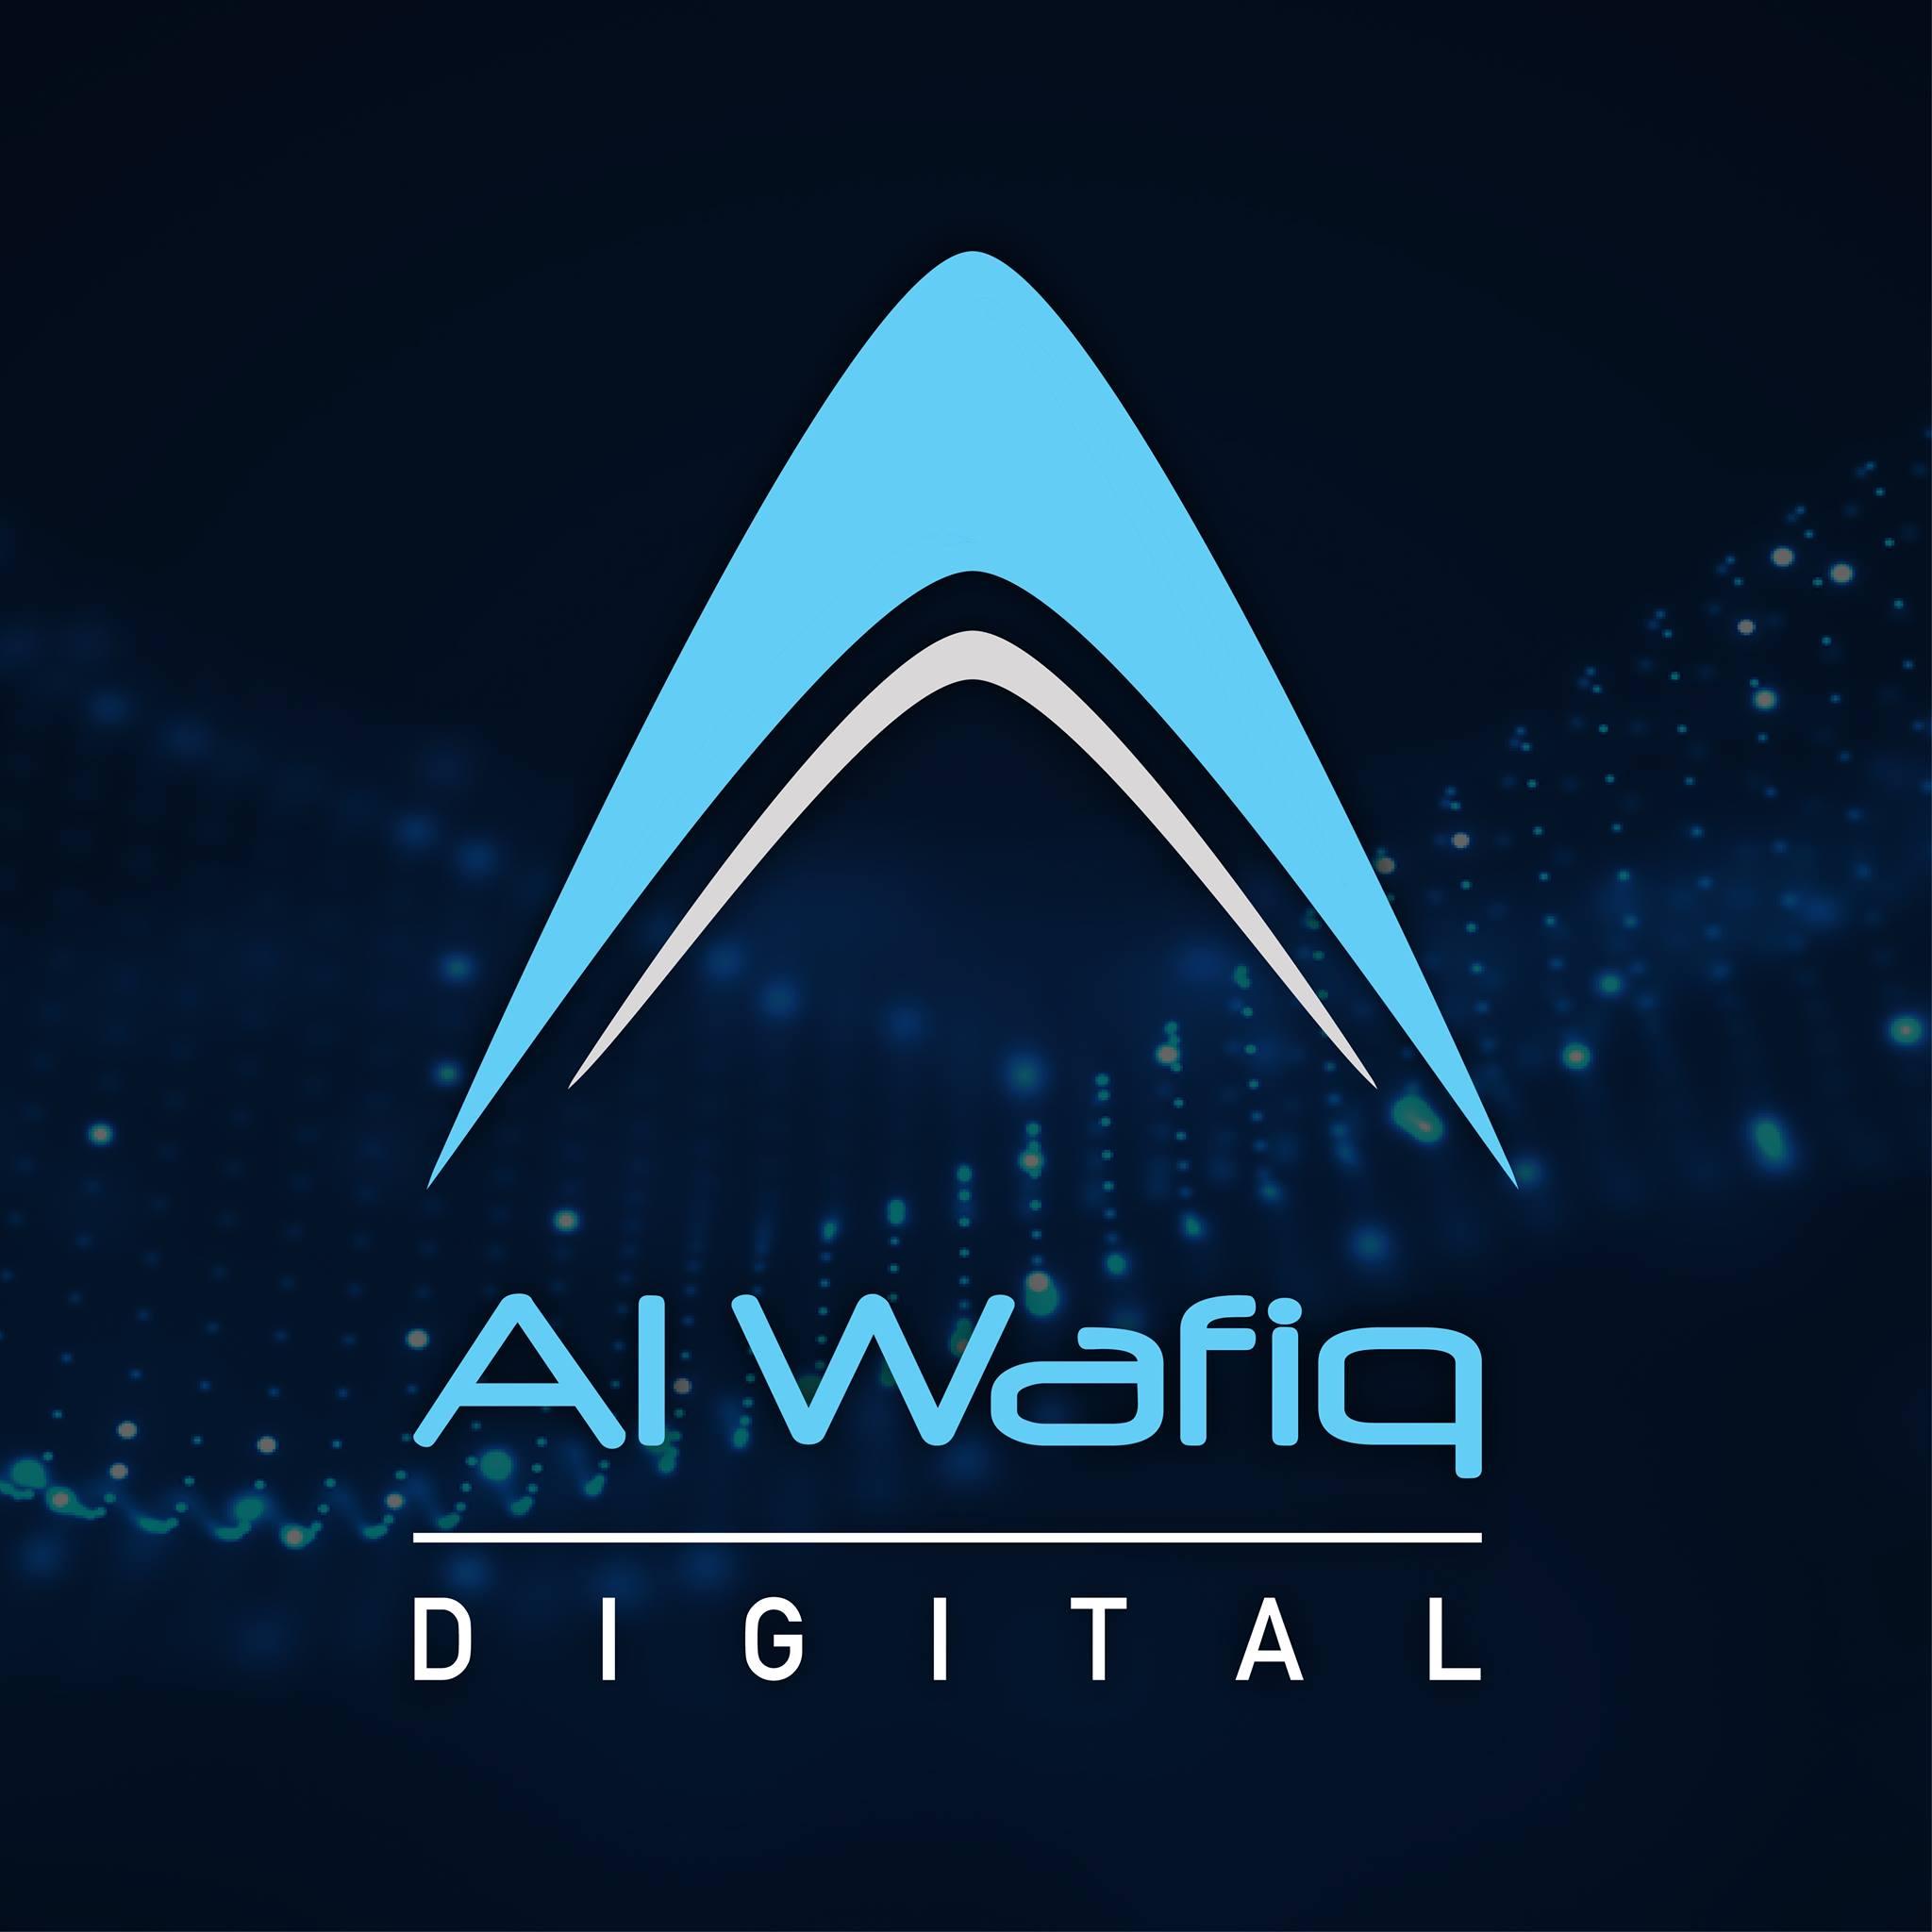 https://www.mncjobsgulf.com/company/al-wafiq-digital